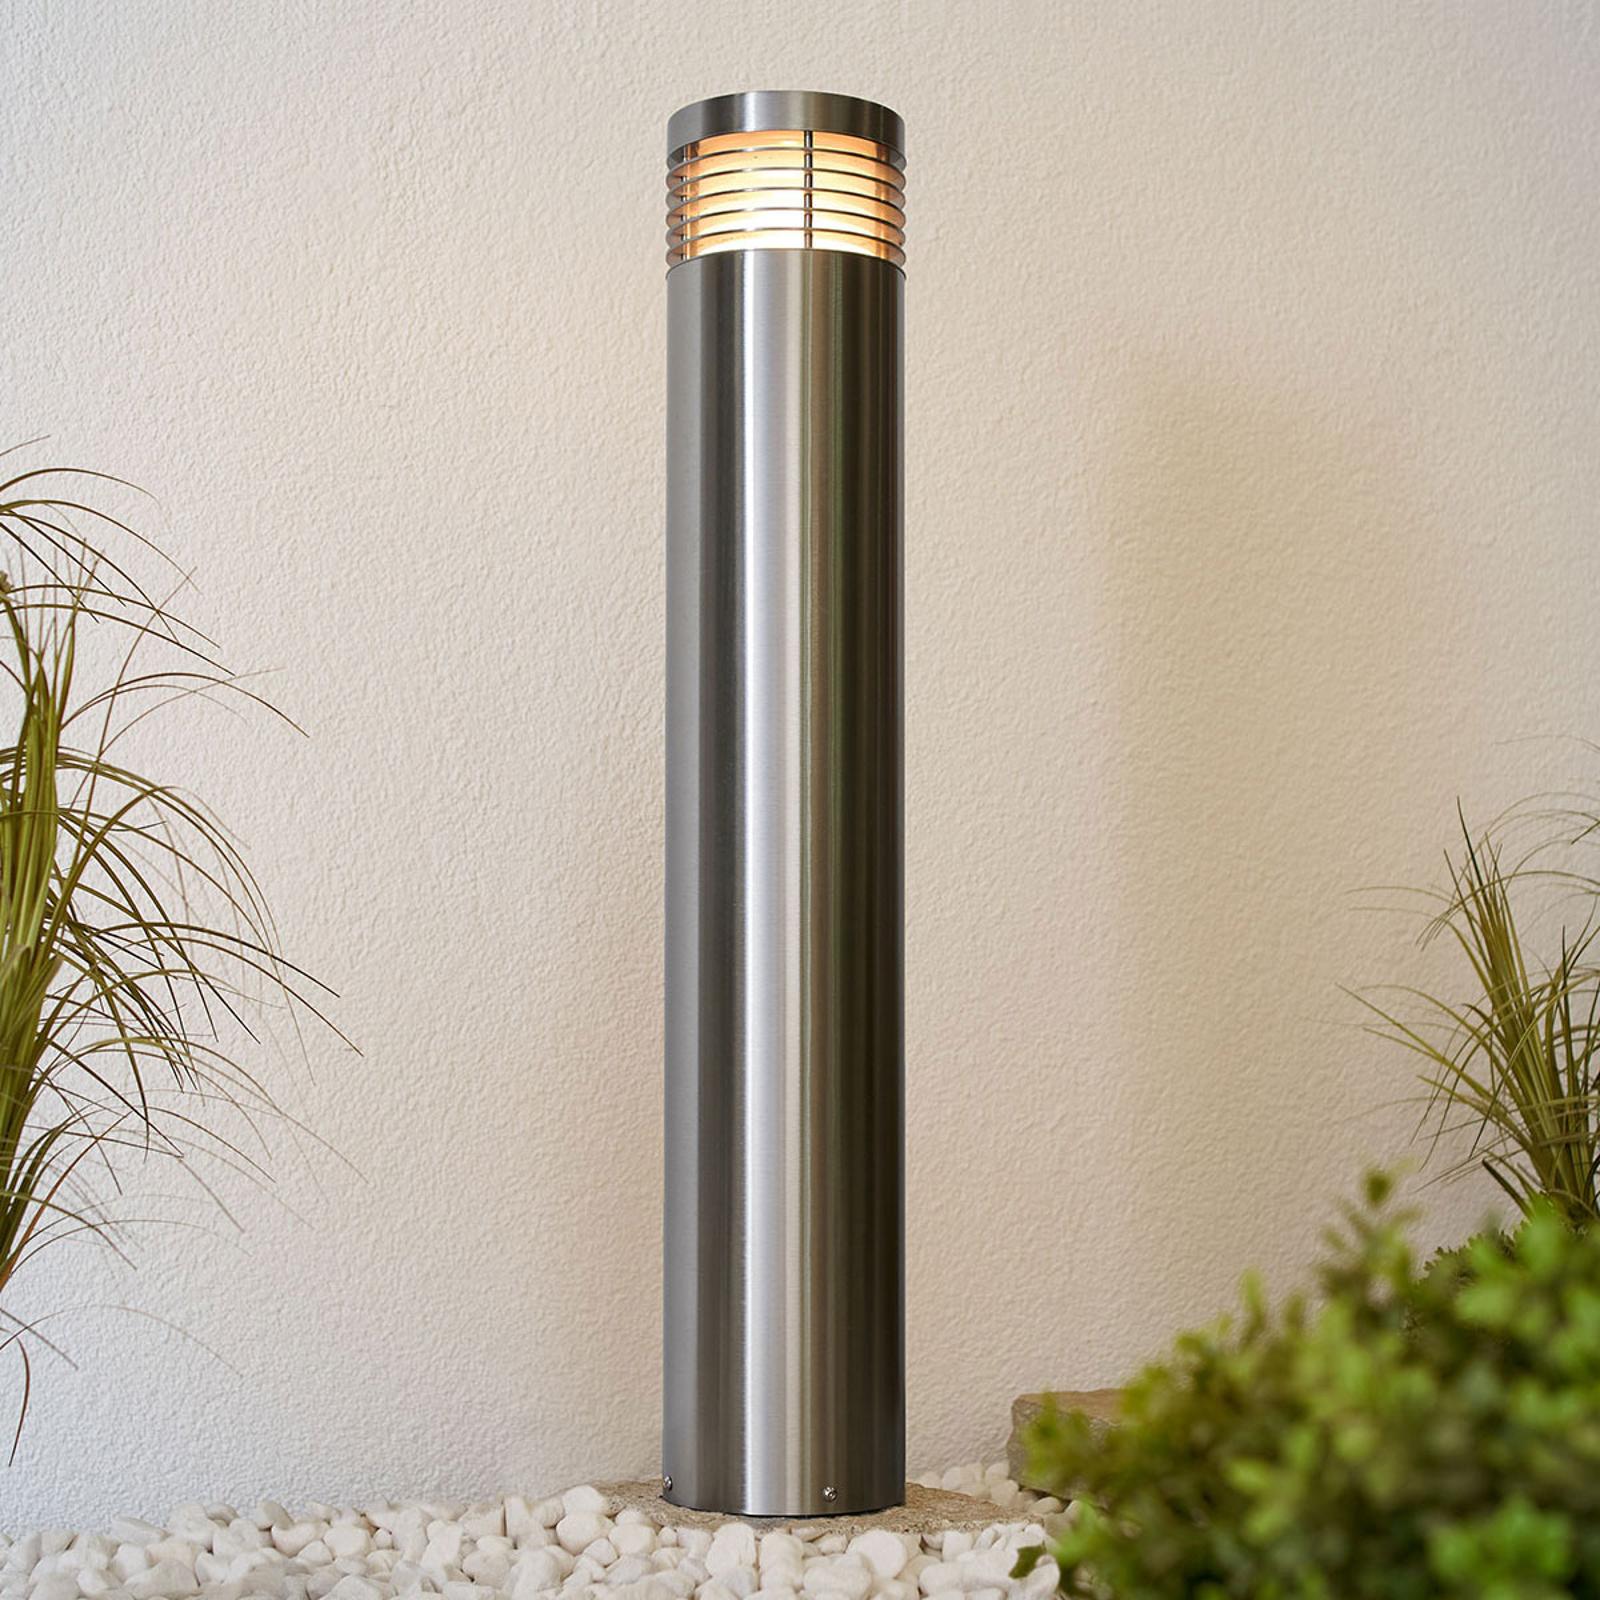 Wegelampe Tomita, Edelstahl V2A seewasserfest 90cm